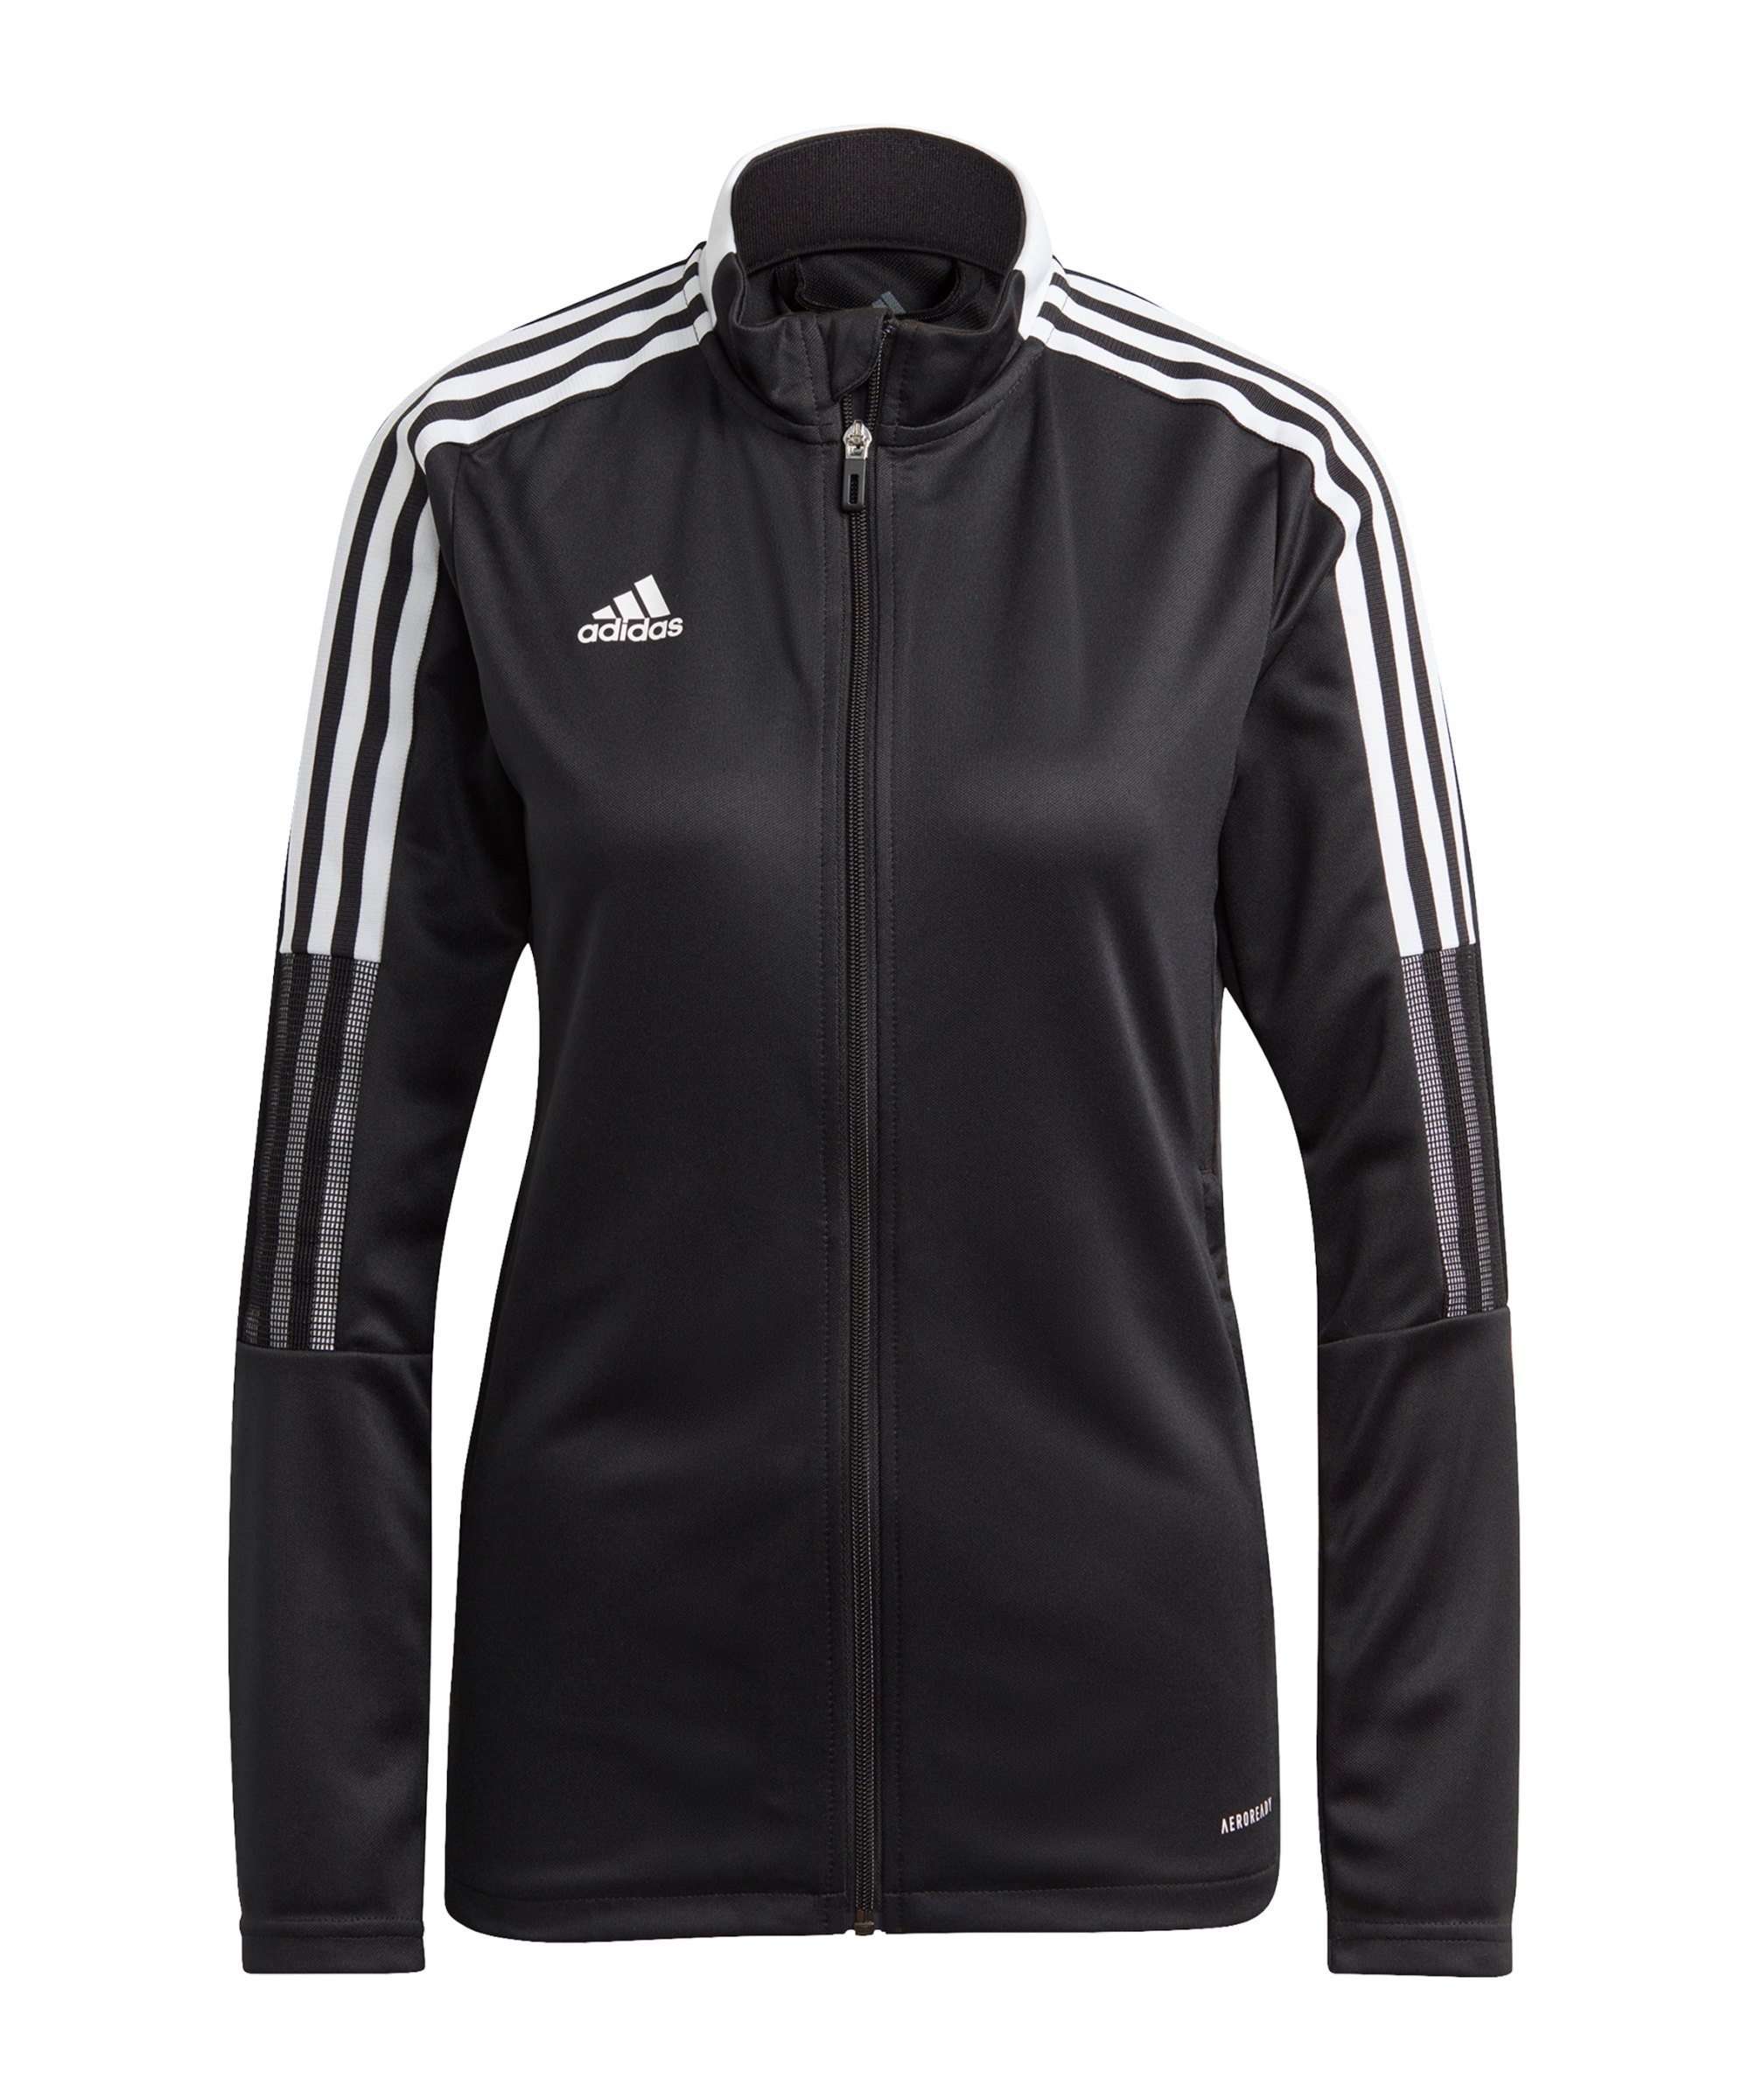 adidas Tiro 21 Trainingsjacke Damen Schwarz - schwarz